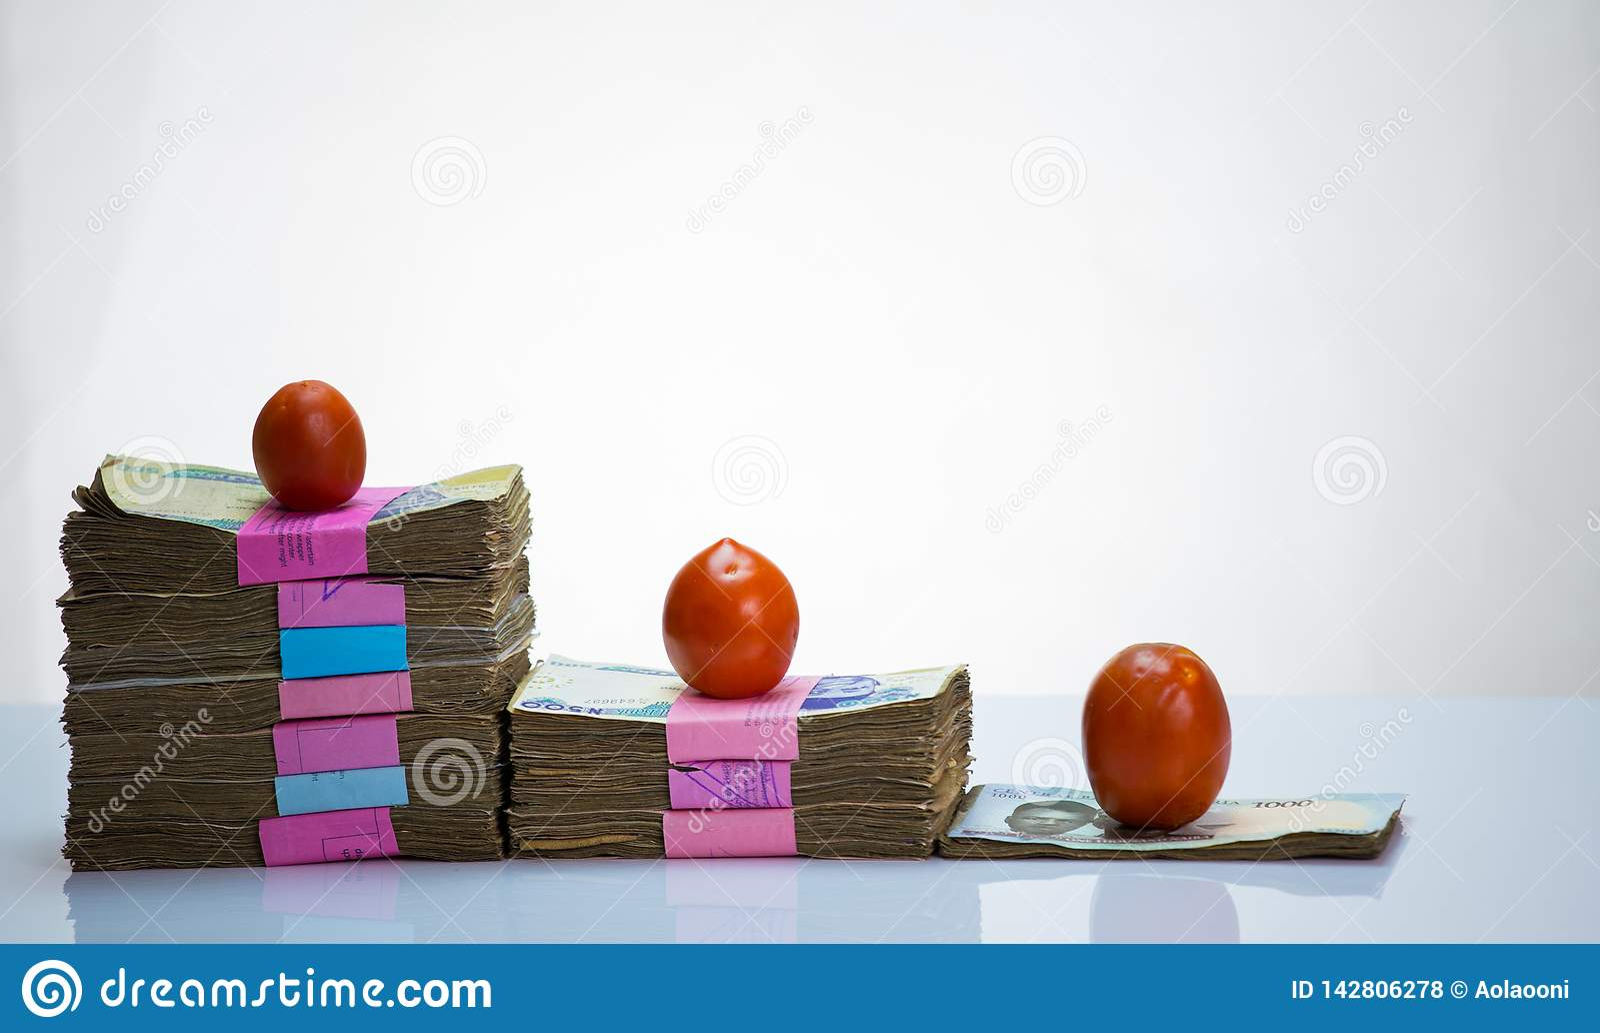 Nigeria lokalna waluta N1000, N500, N200 naira notatki w bundleand pomidorach